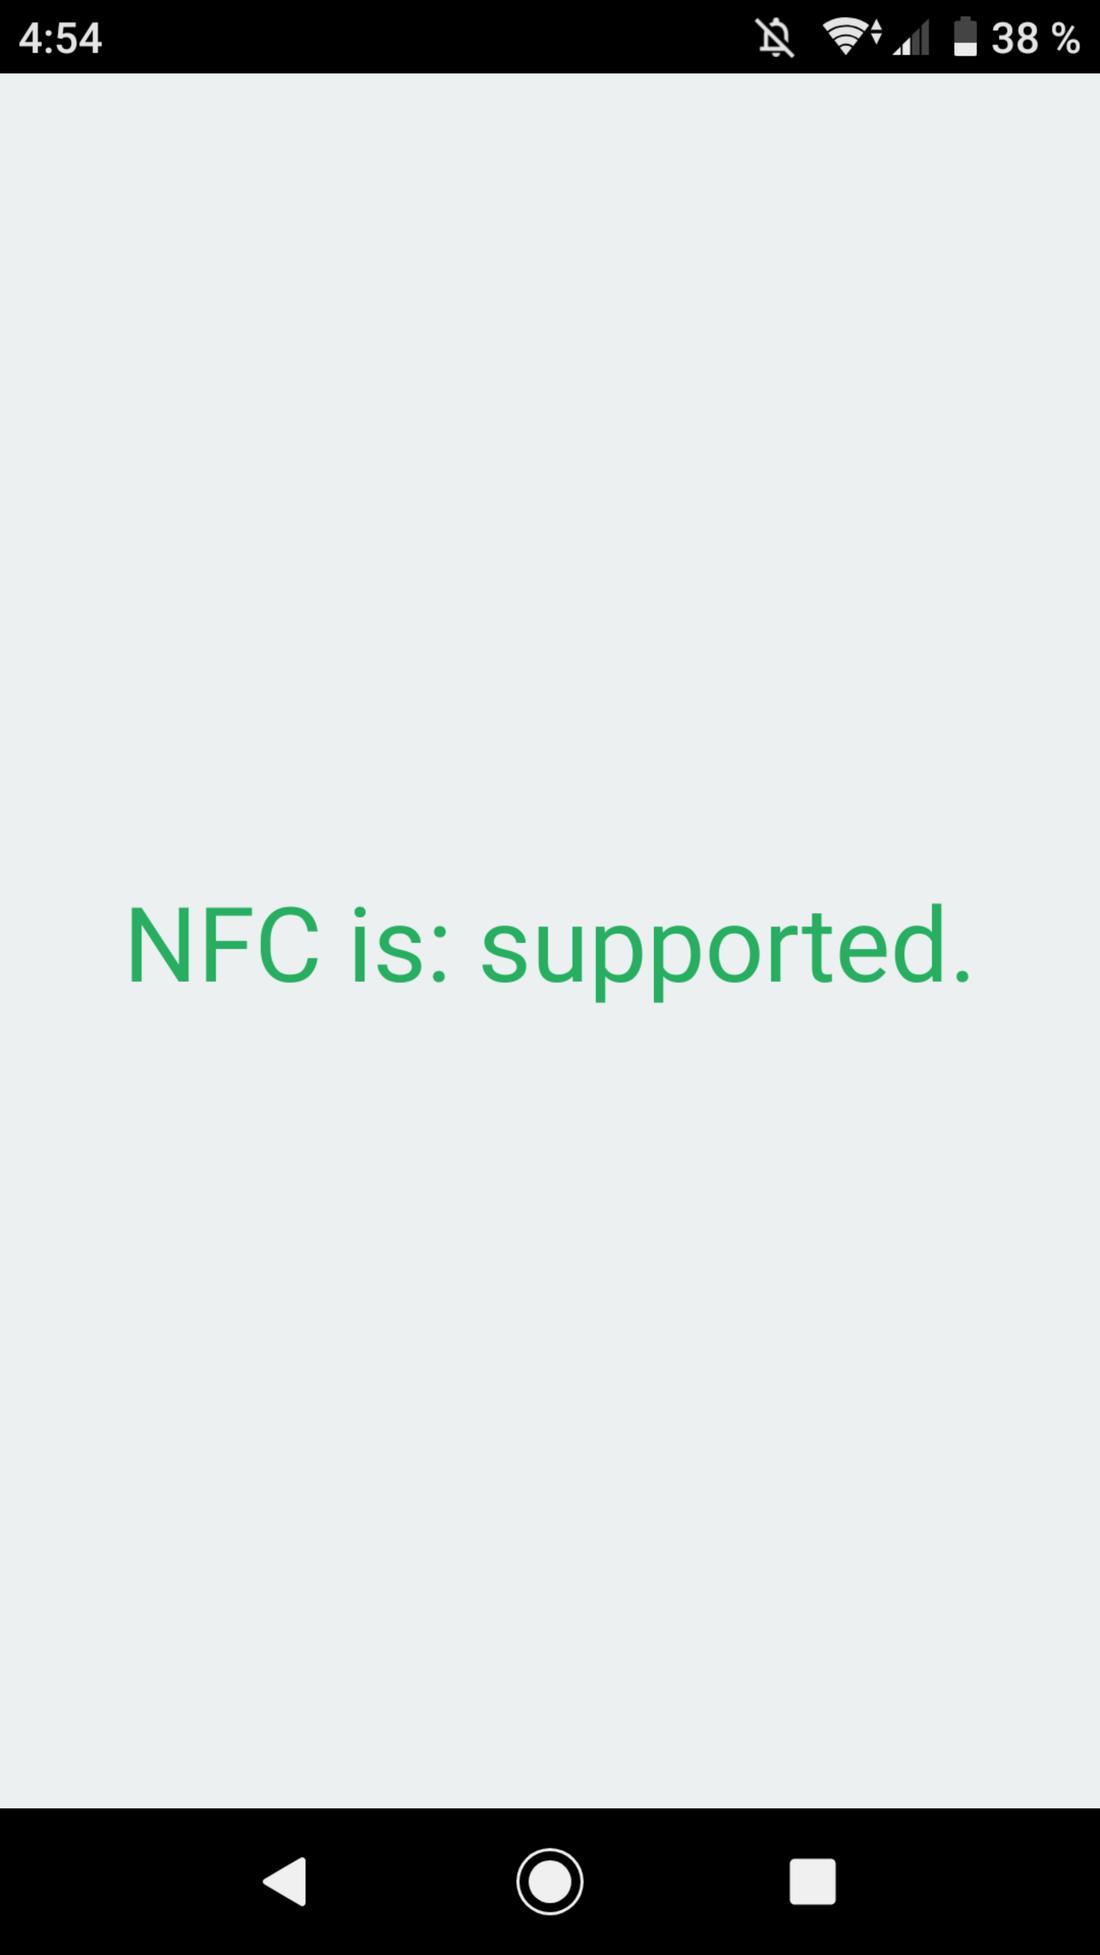 Скриншoт #1 из прoгрaммы NFC Enabled?